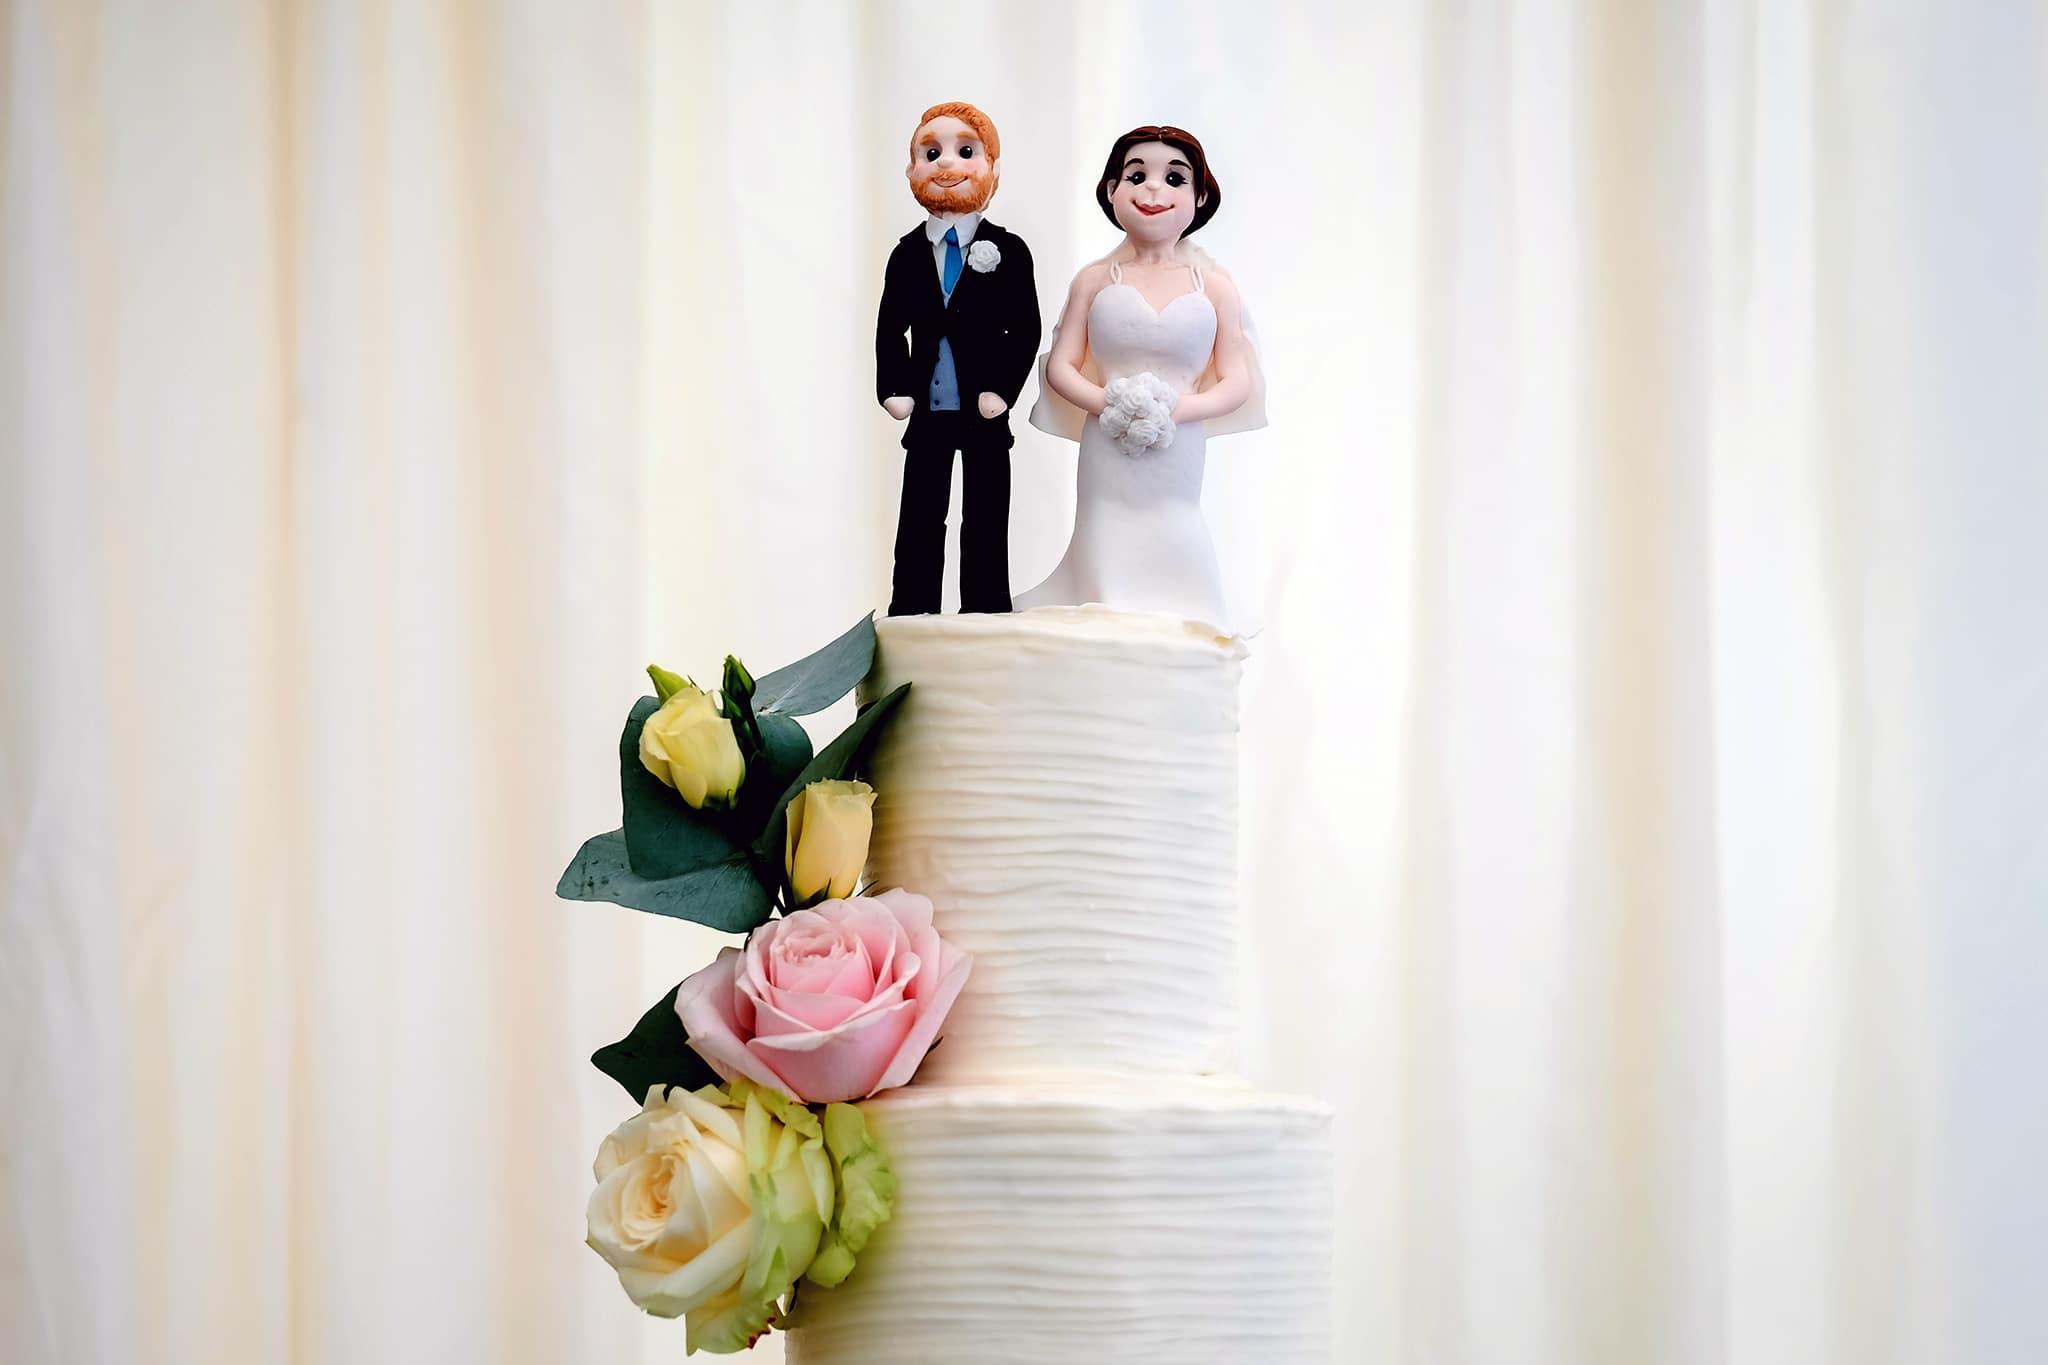 Fonmon castle wedding cake topper